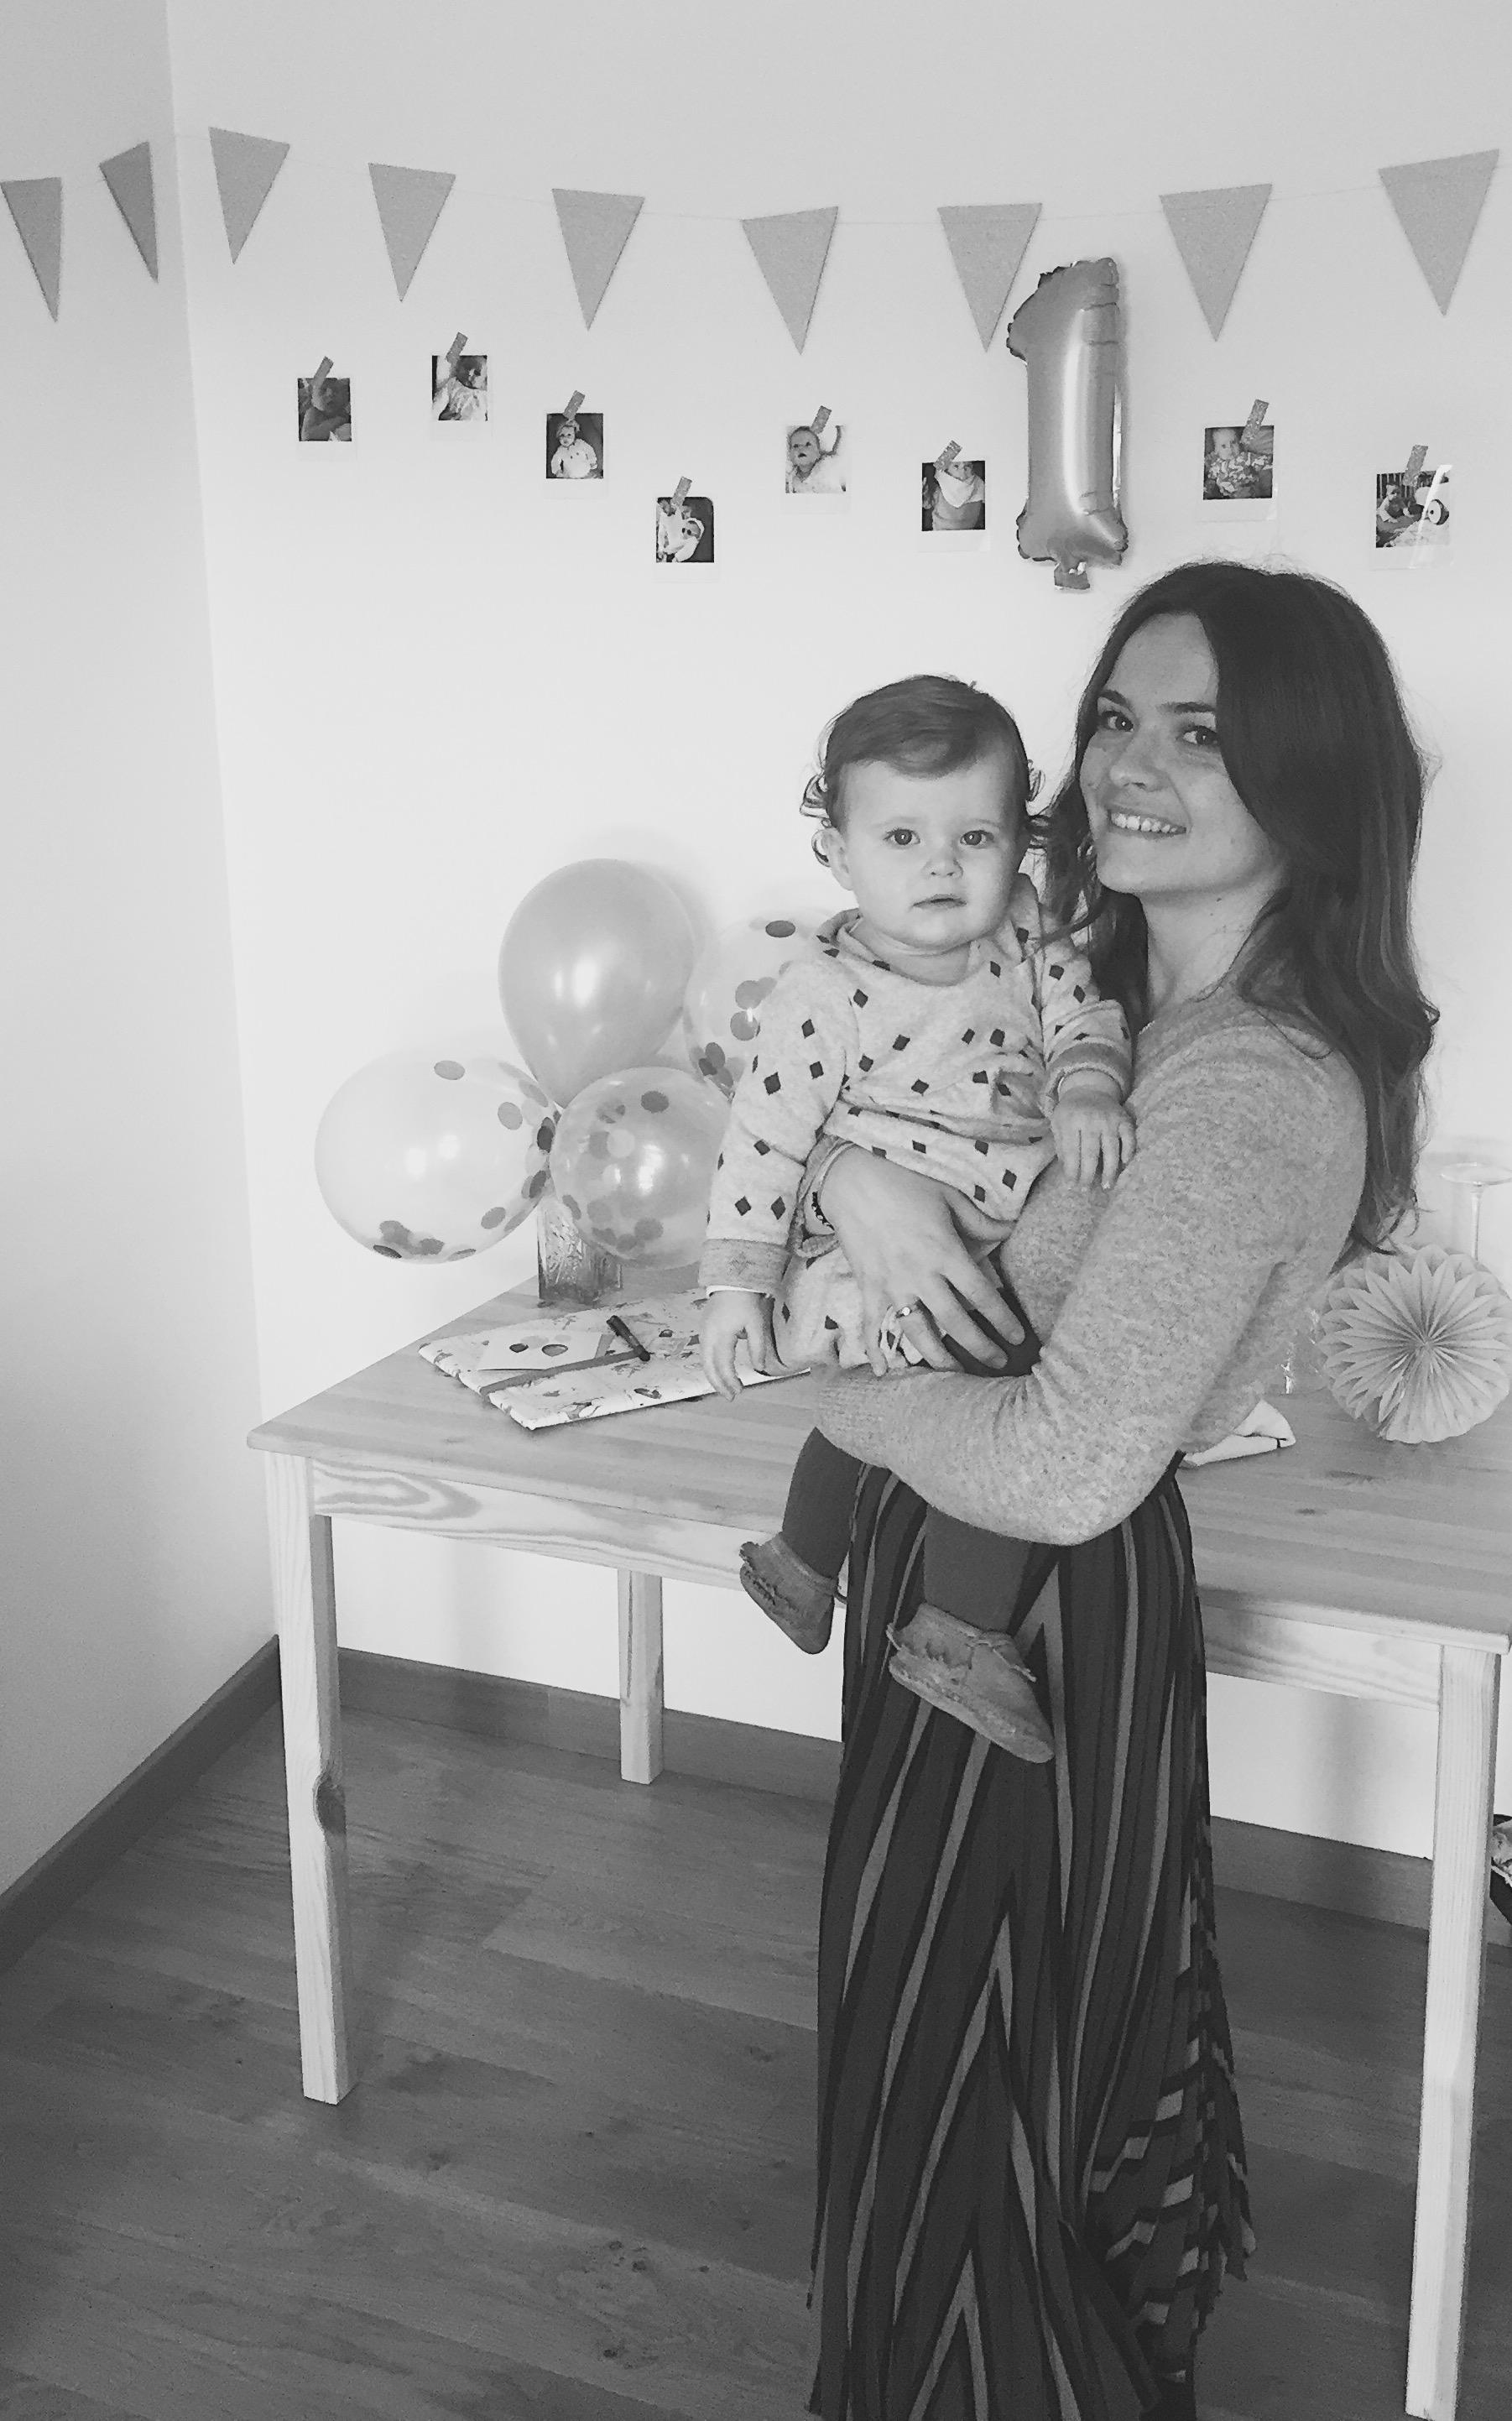 Agathe, maman de Madeleine 15 mois – Fondatrice de Coeur de beurre.